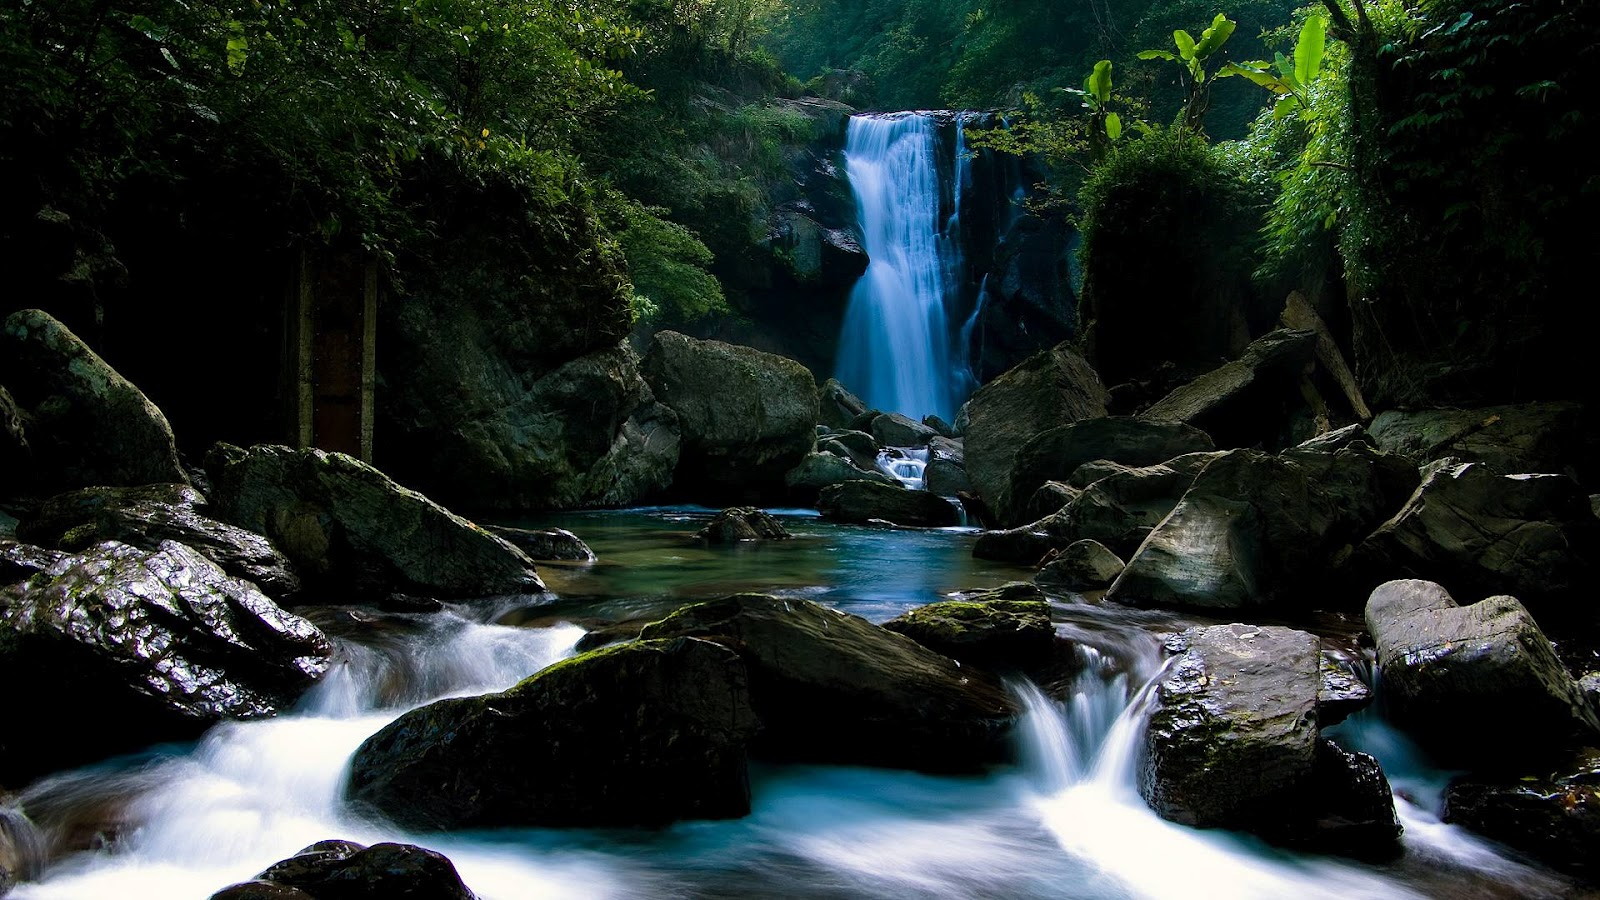 http://1.bp.blogspot.com/-kpyd1DHzy9w/T6E5IsiSNrI/AAAAAAAAAFg/BZqPL1bTbyg/s1600/Nature_Full_HD_Wallpaper_1920_1080.jpg